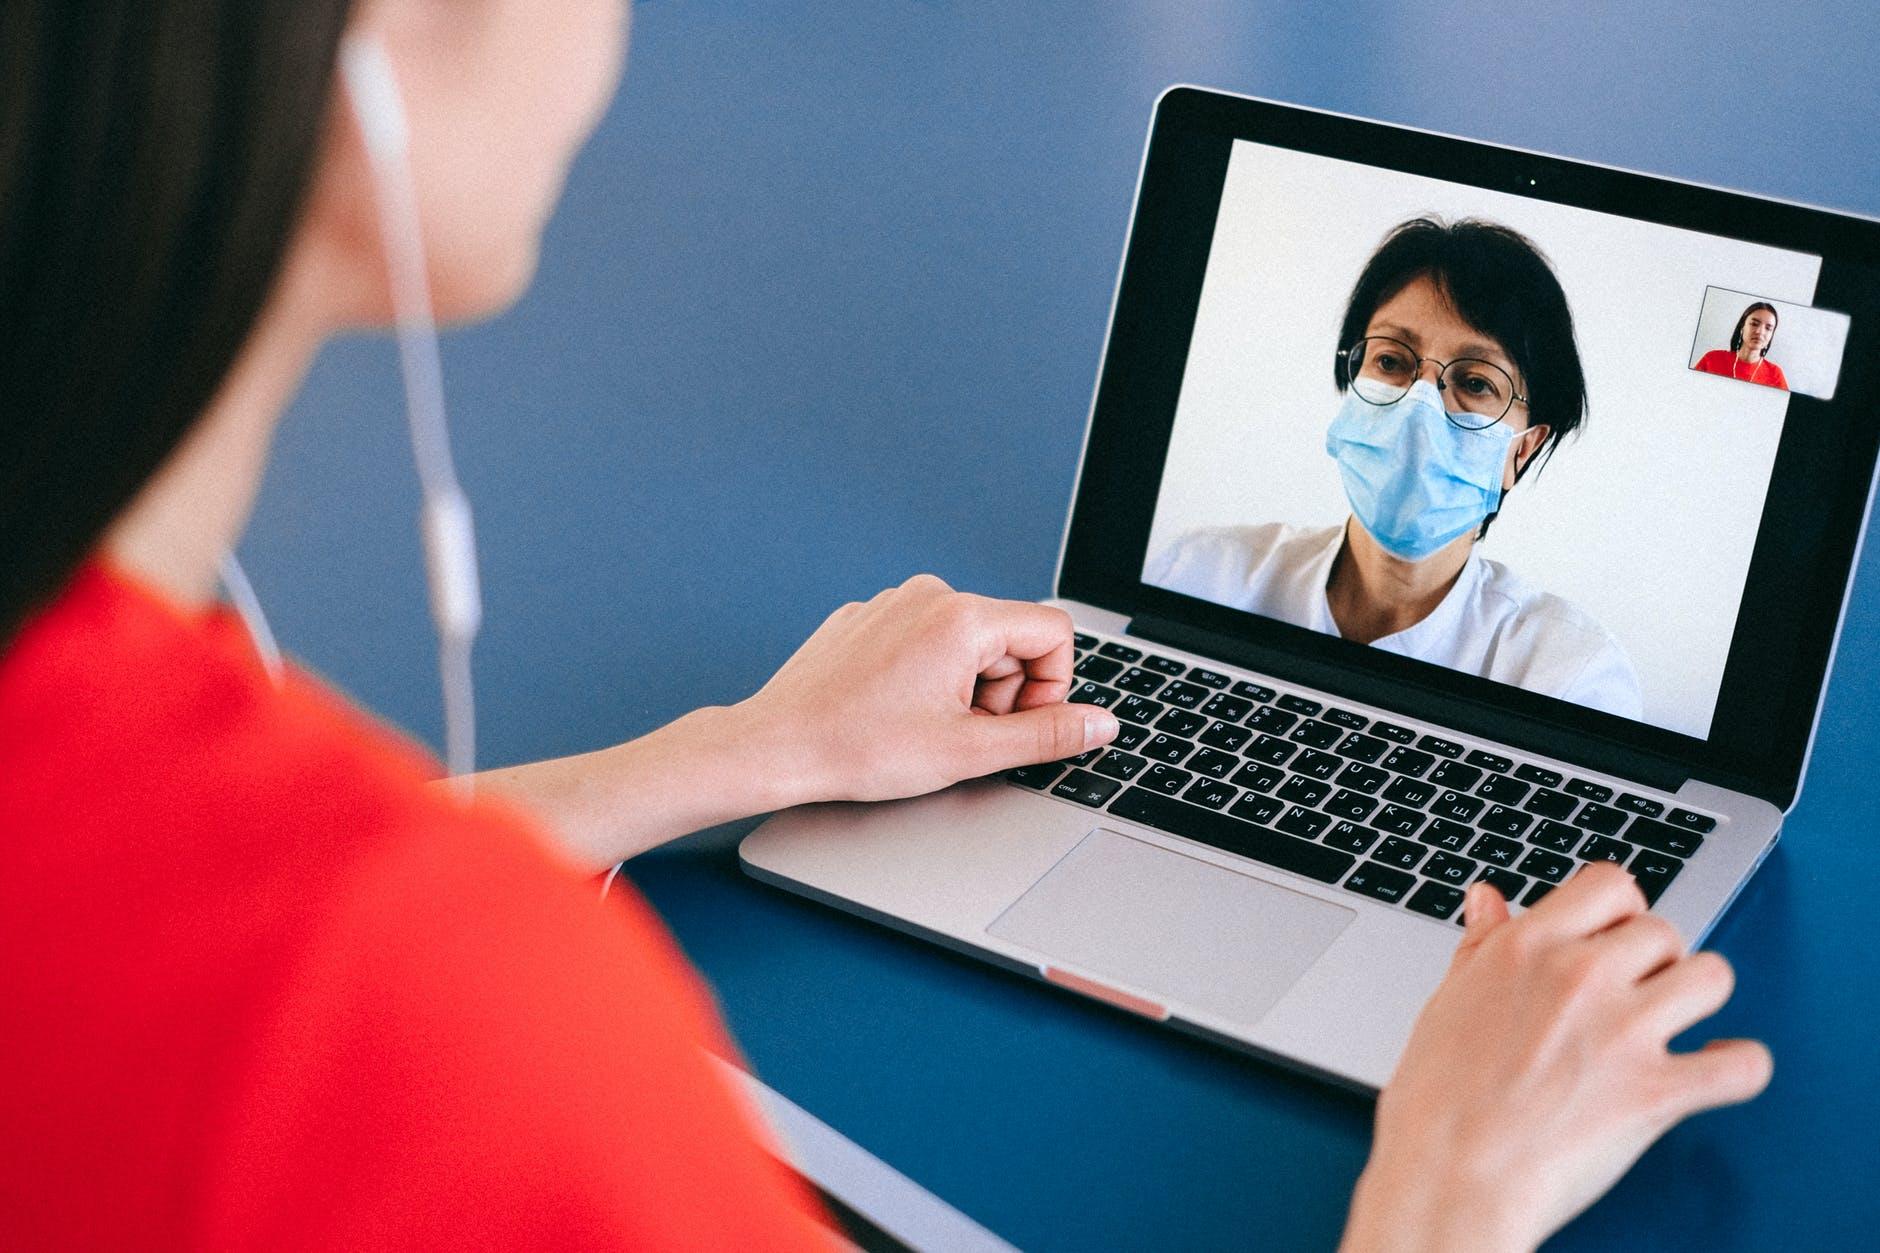 The Rise of Remote Care